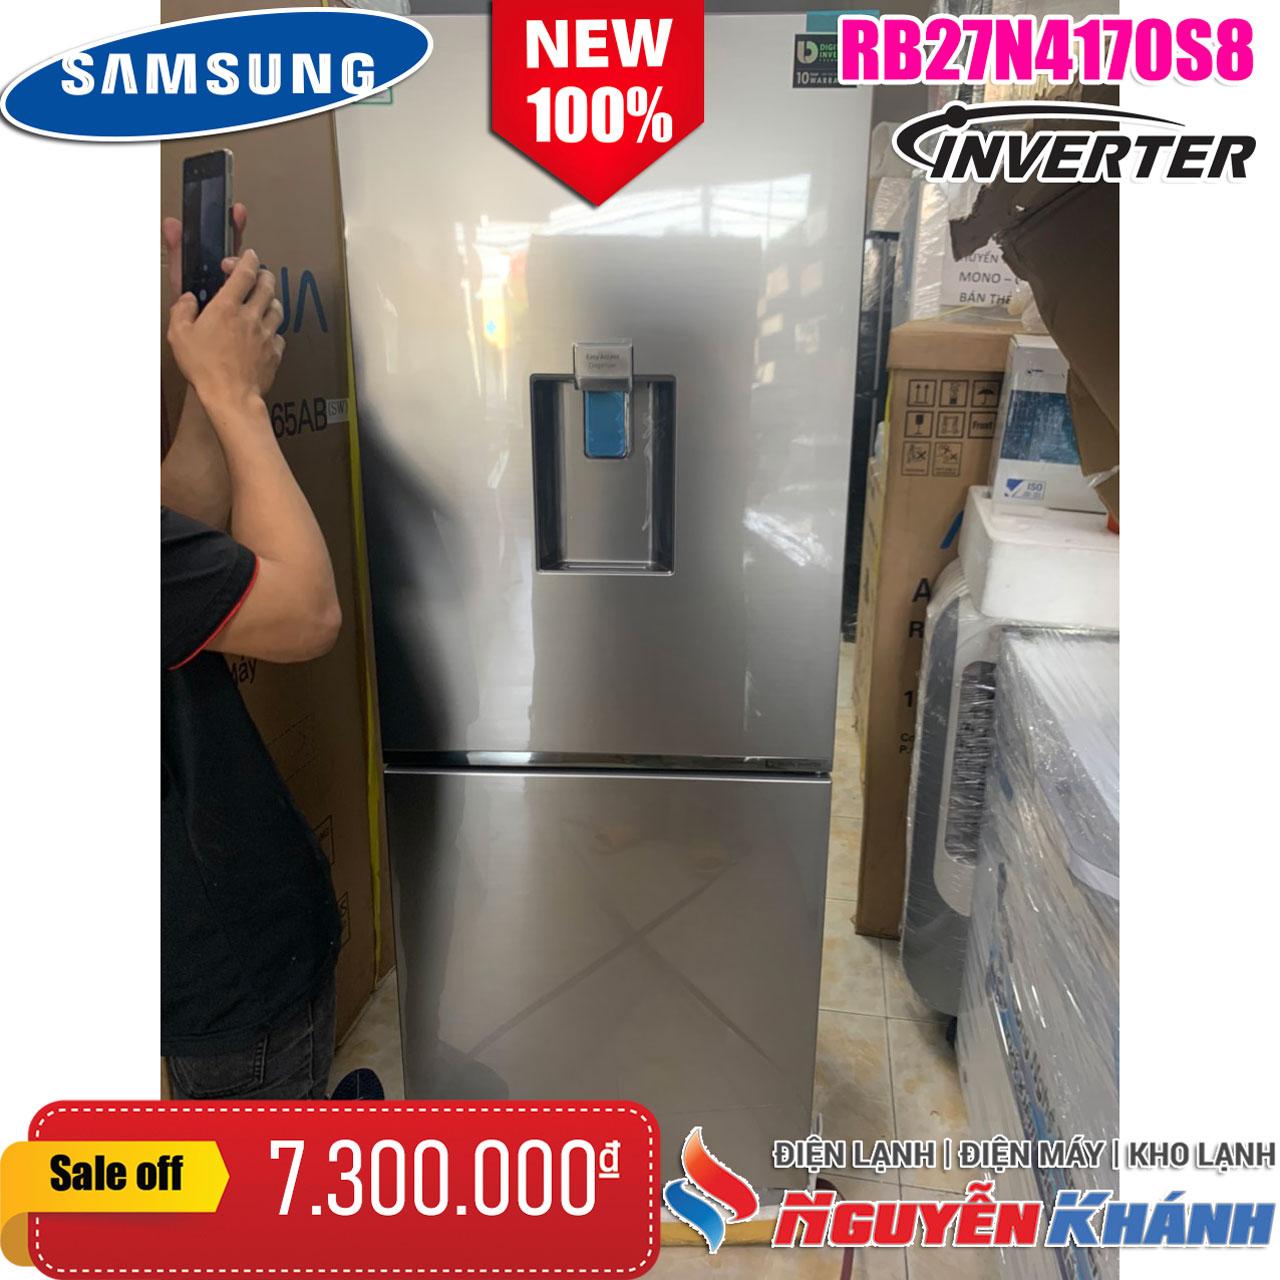 Tủ lạnh Samsung InverterRB27N4170S8/SV